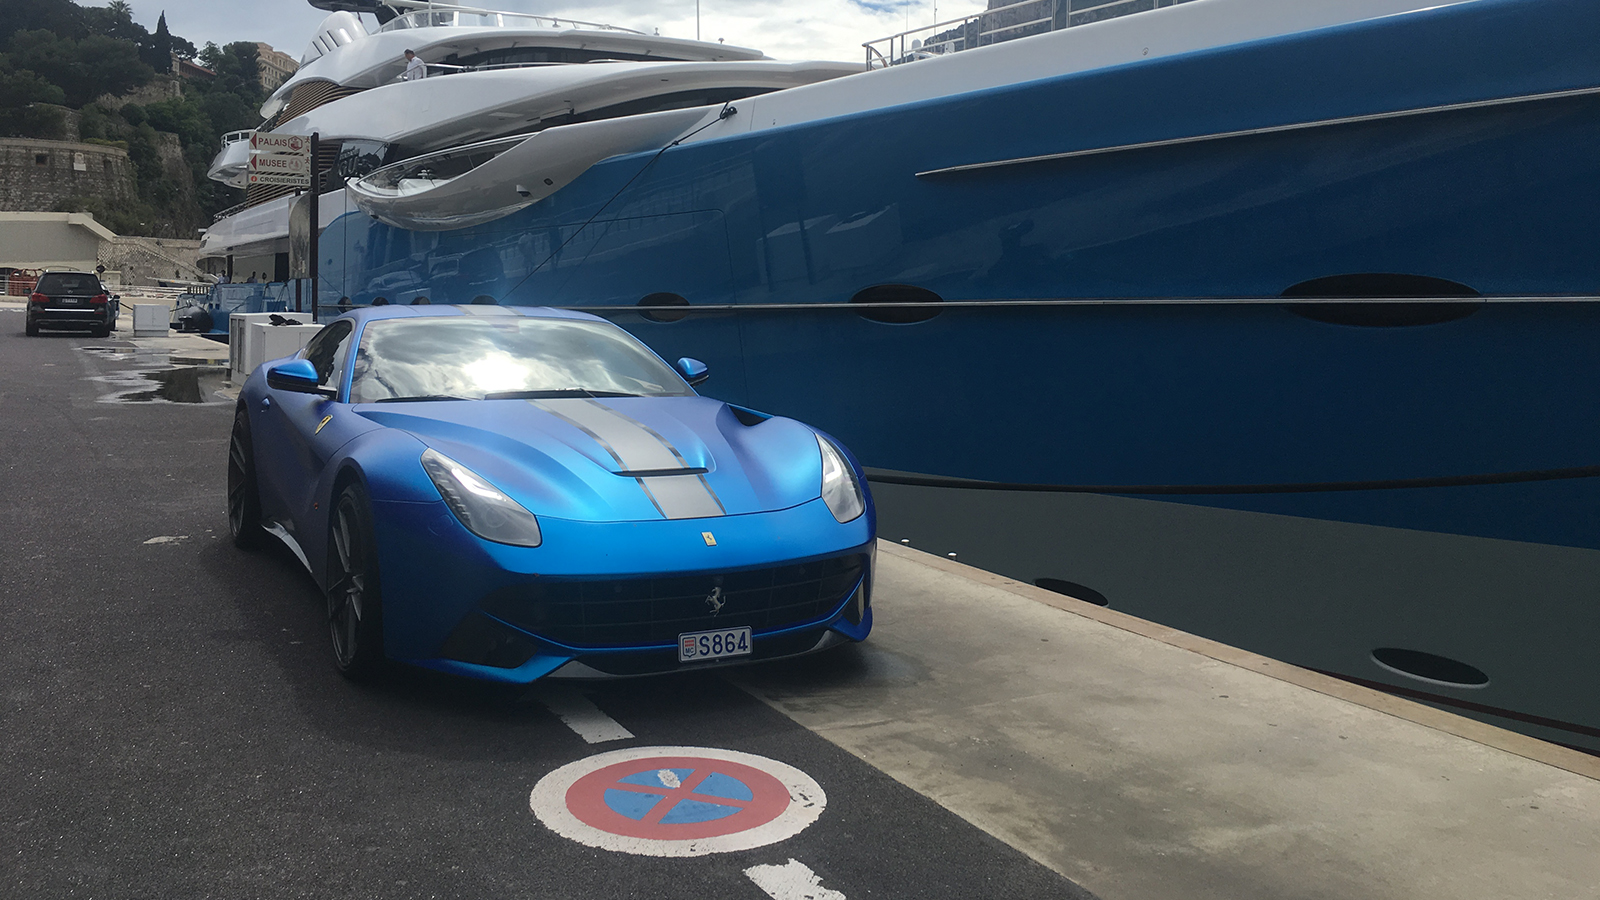 F12-cruise-03